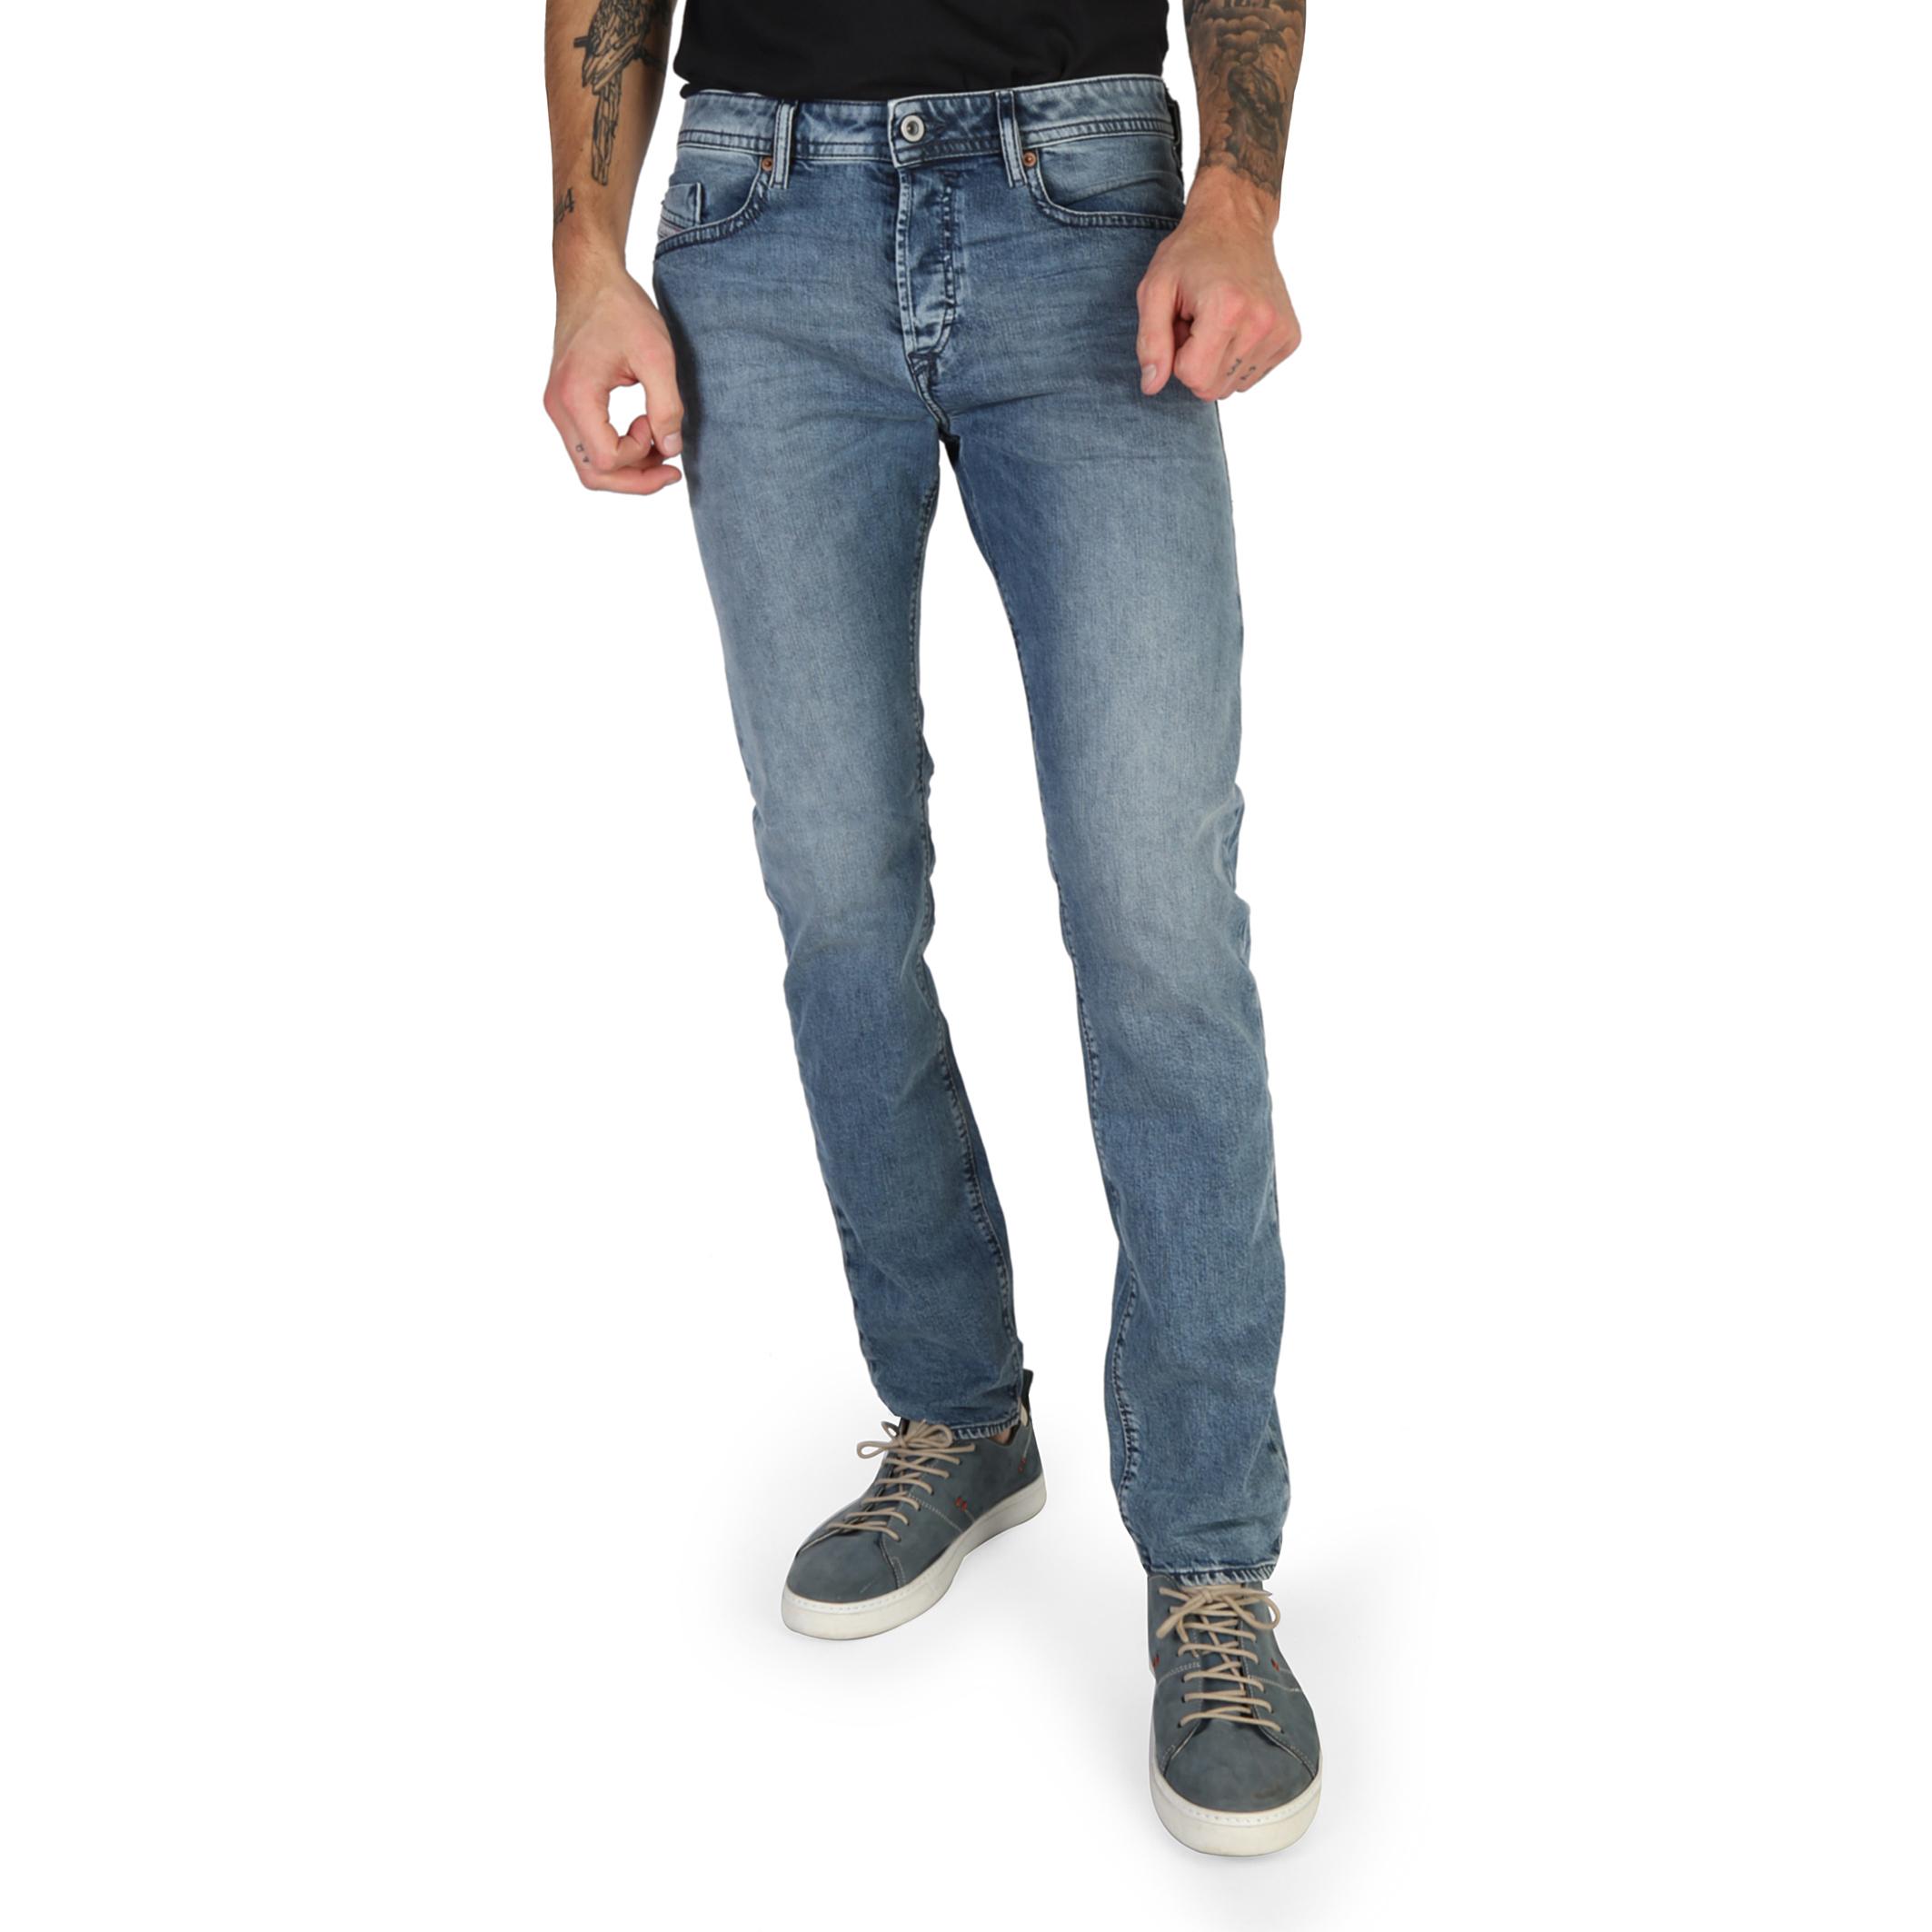 Jeans Diesel BUSTER_L32_00SDHB Uomo Blu 103832